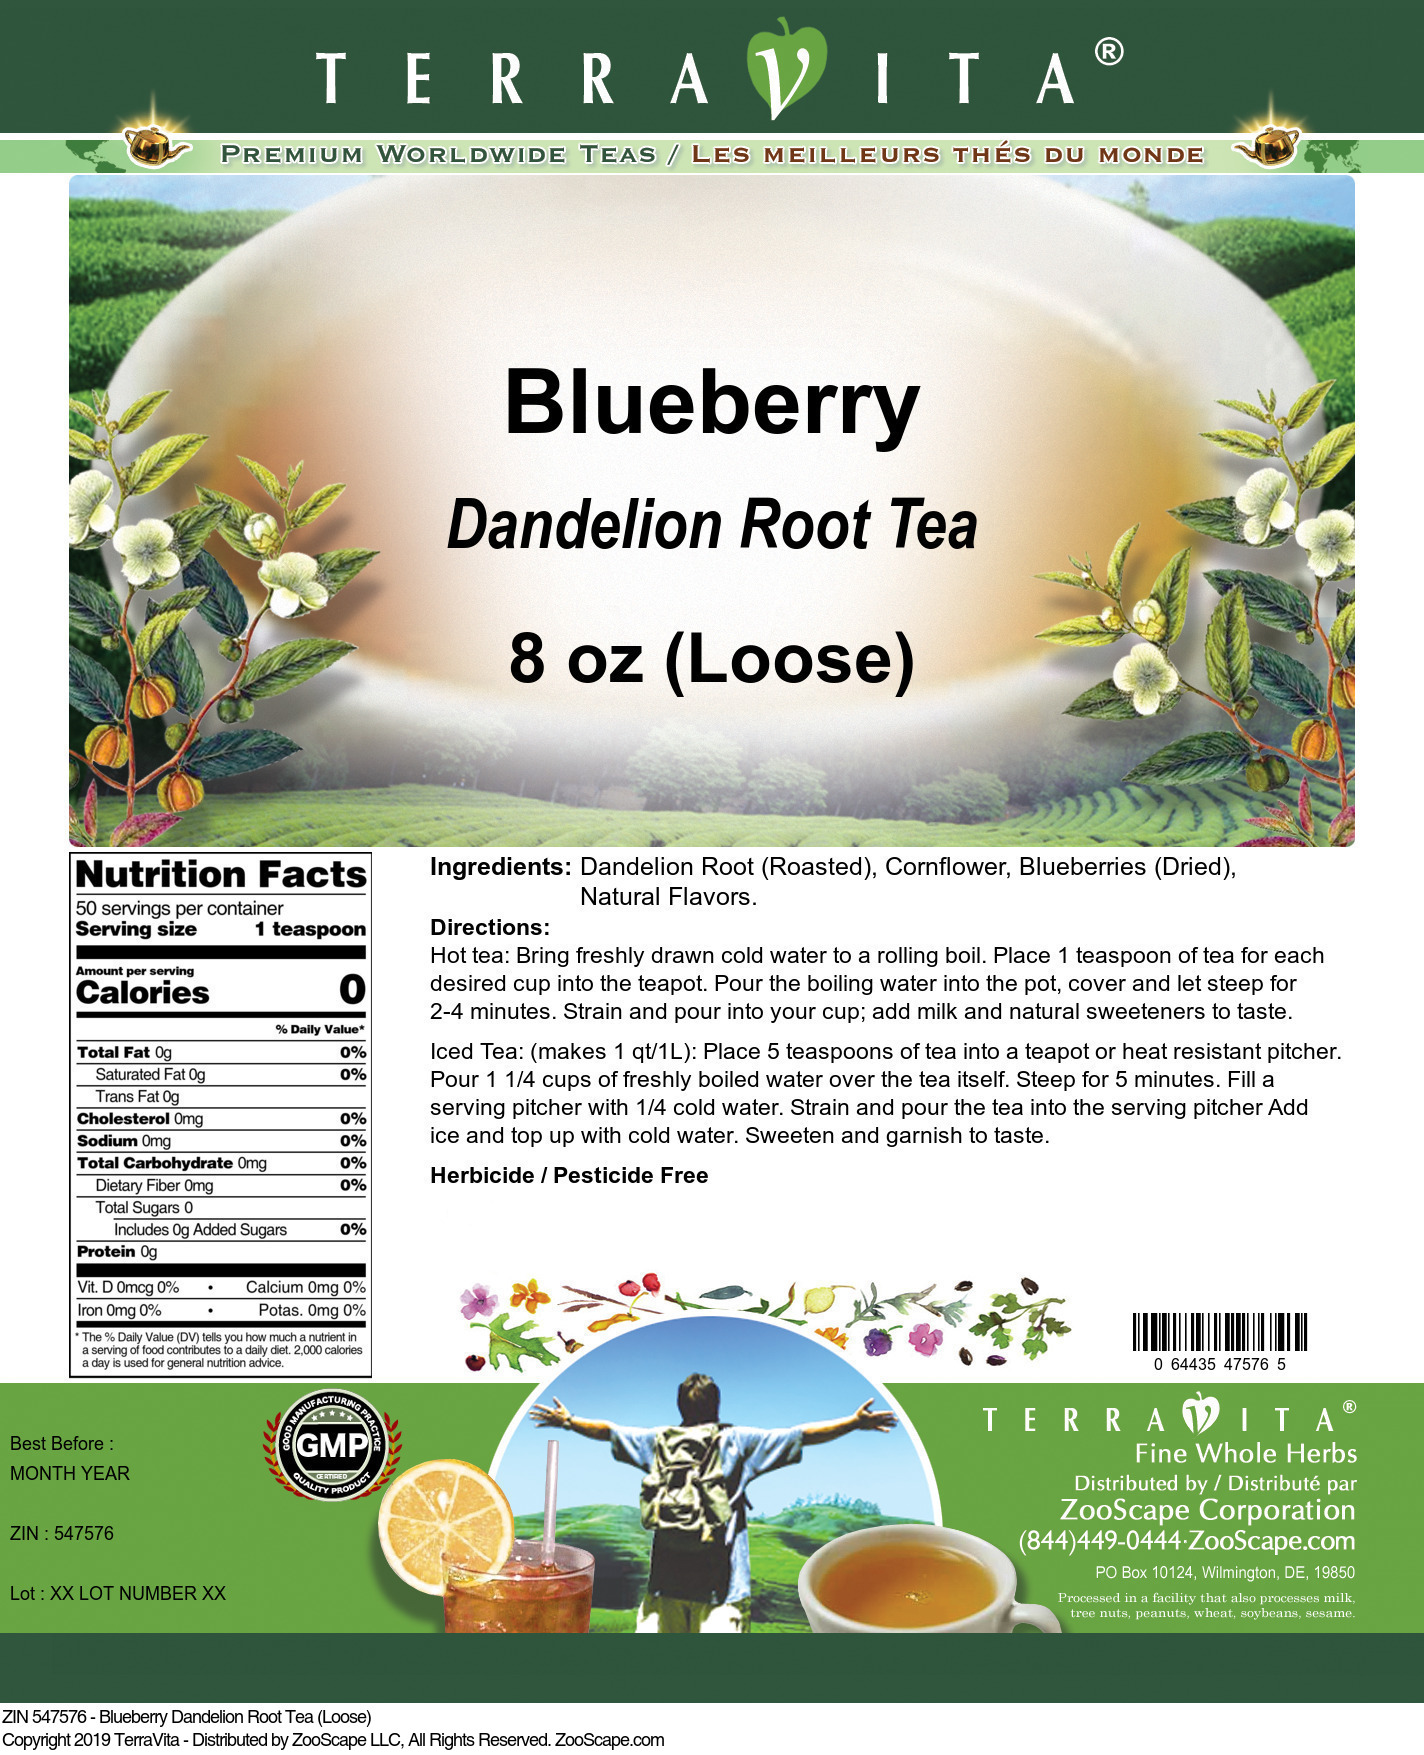 Blueberry Dandelion Root Tea (Loose)